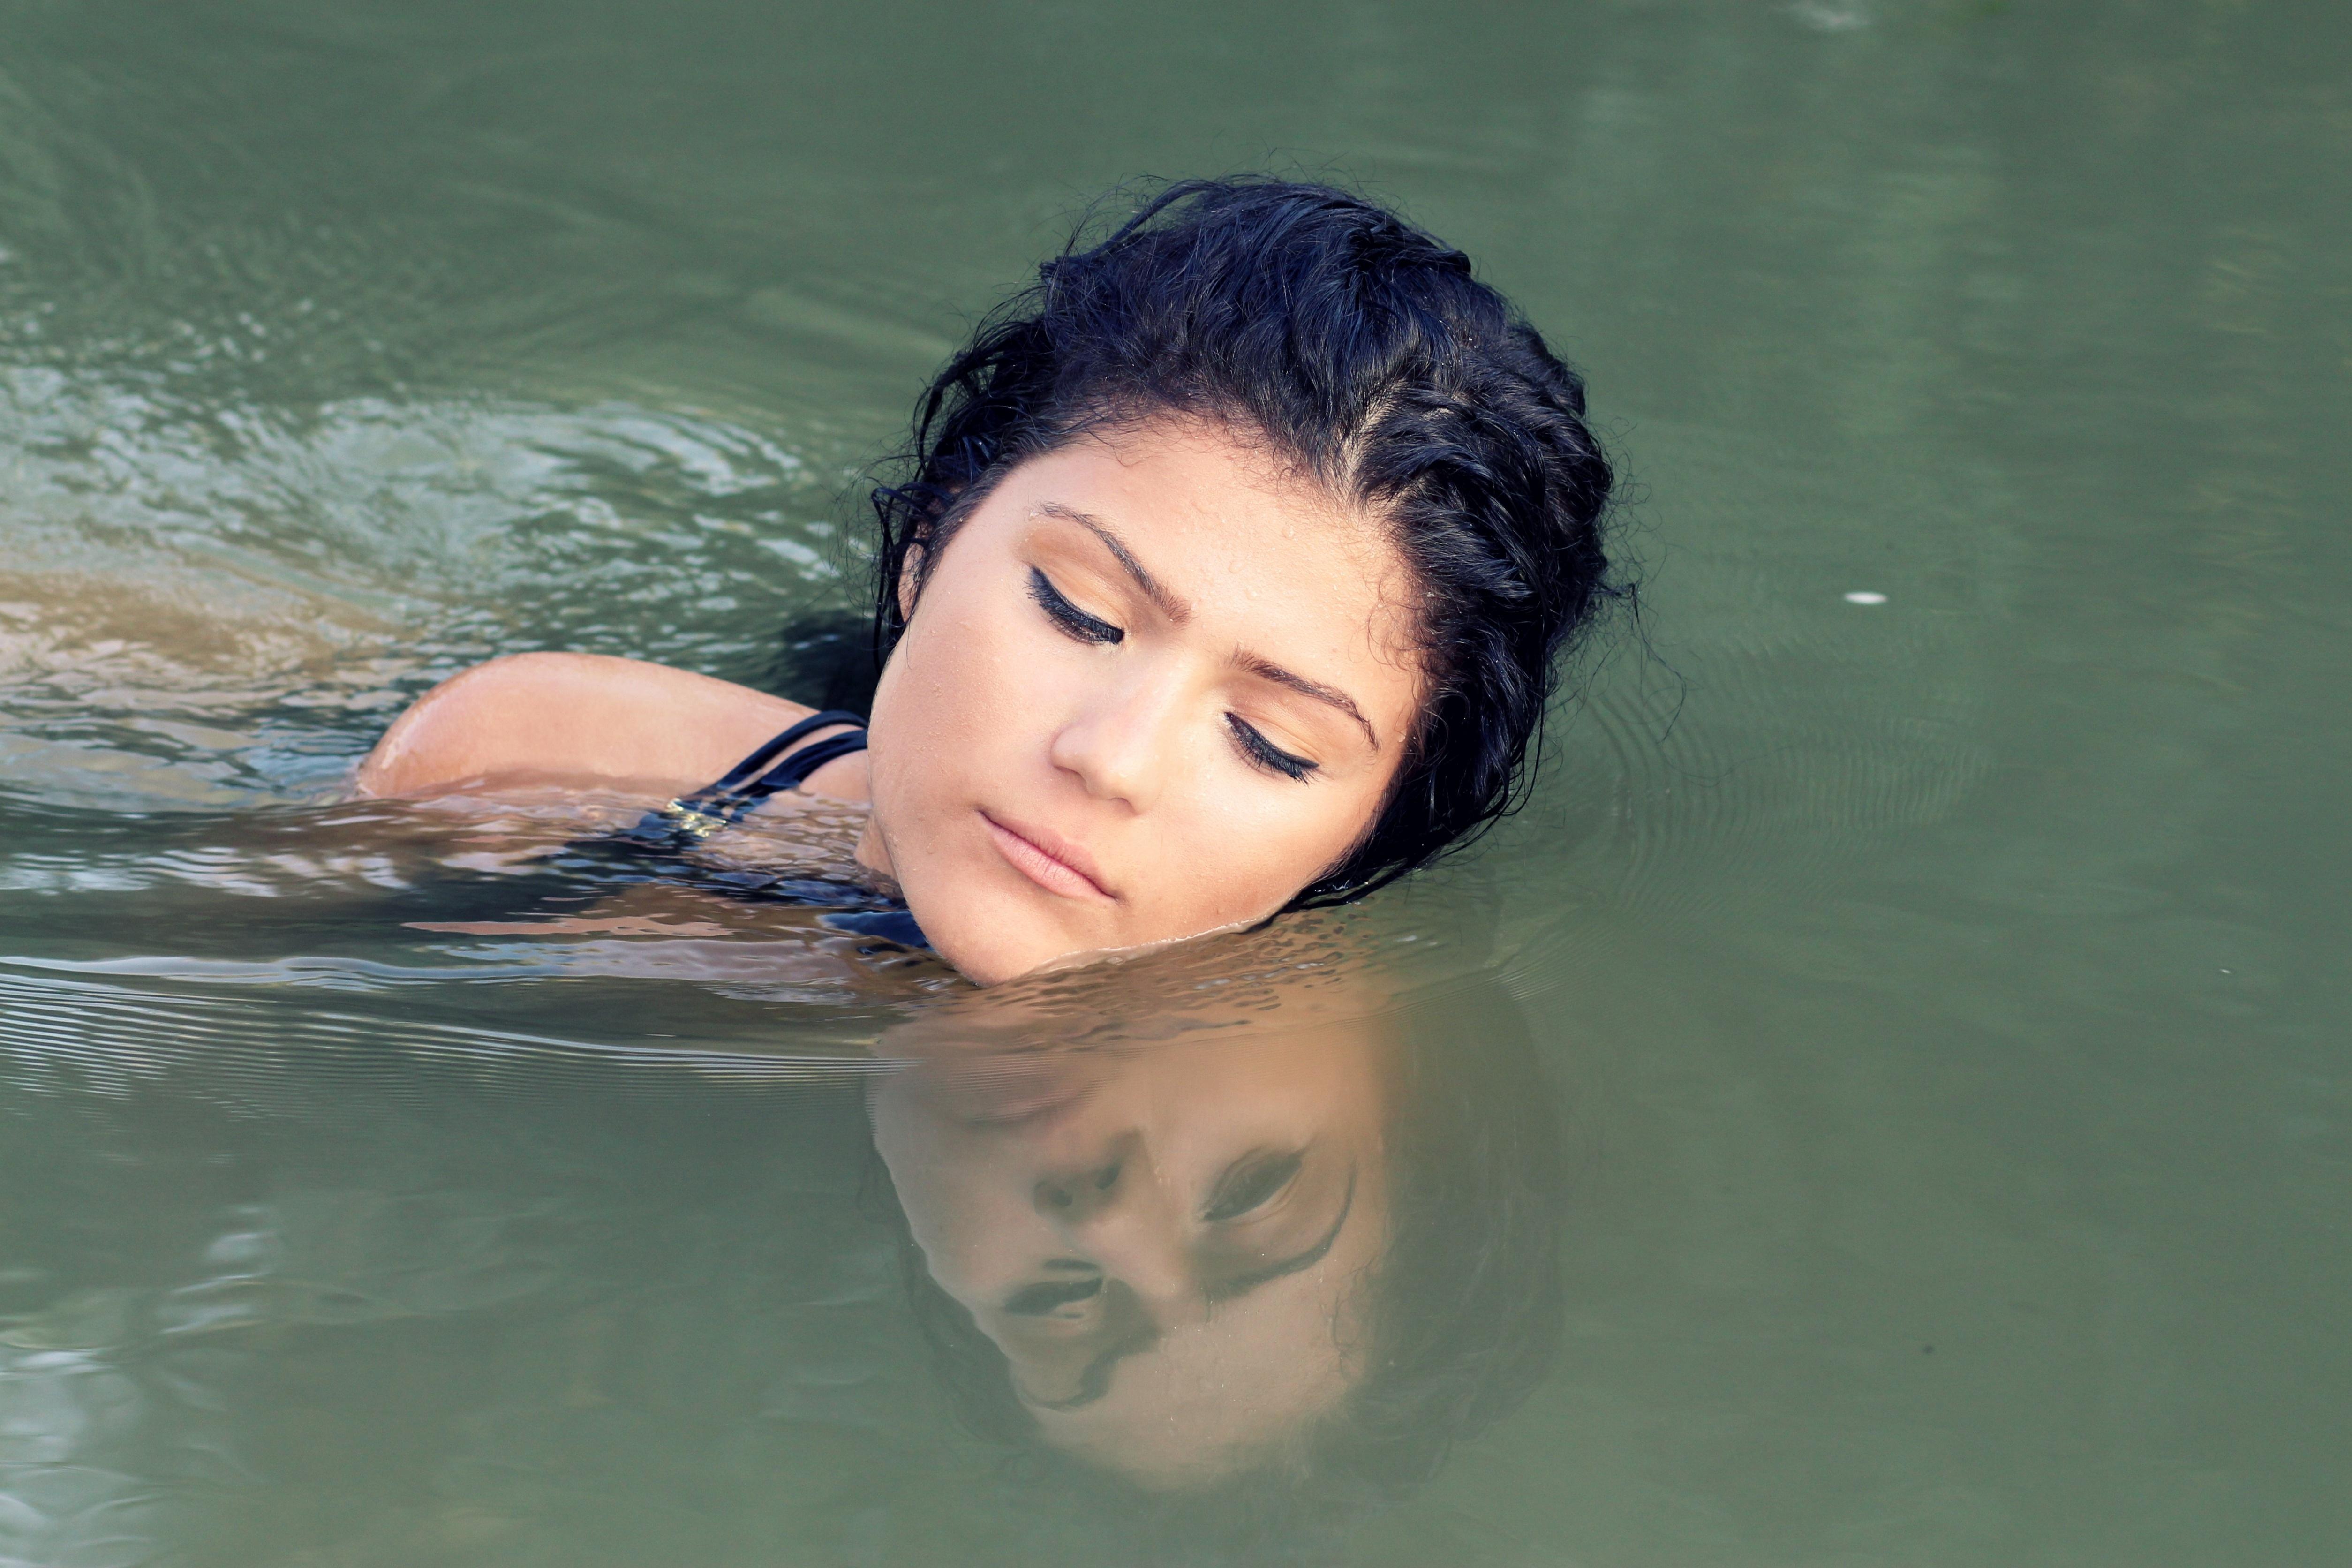 Картинка купающейся девушки брюнетка